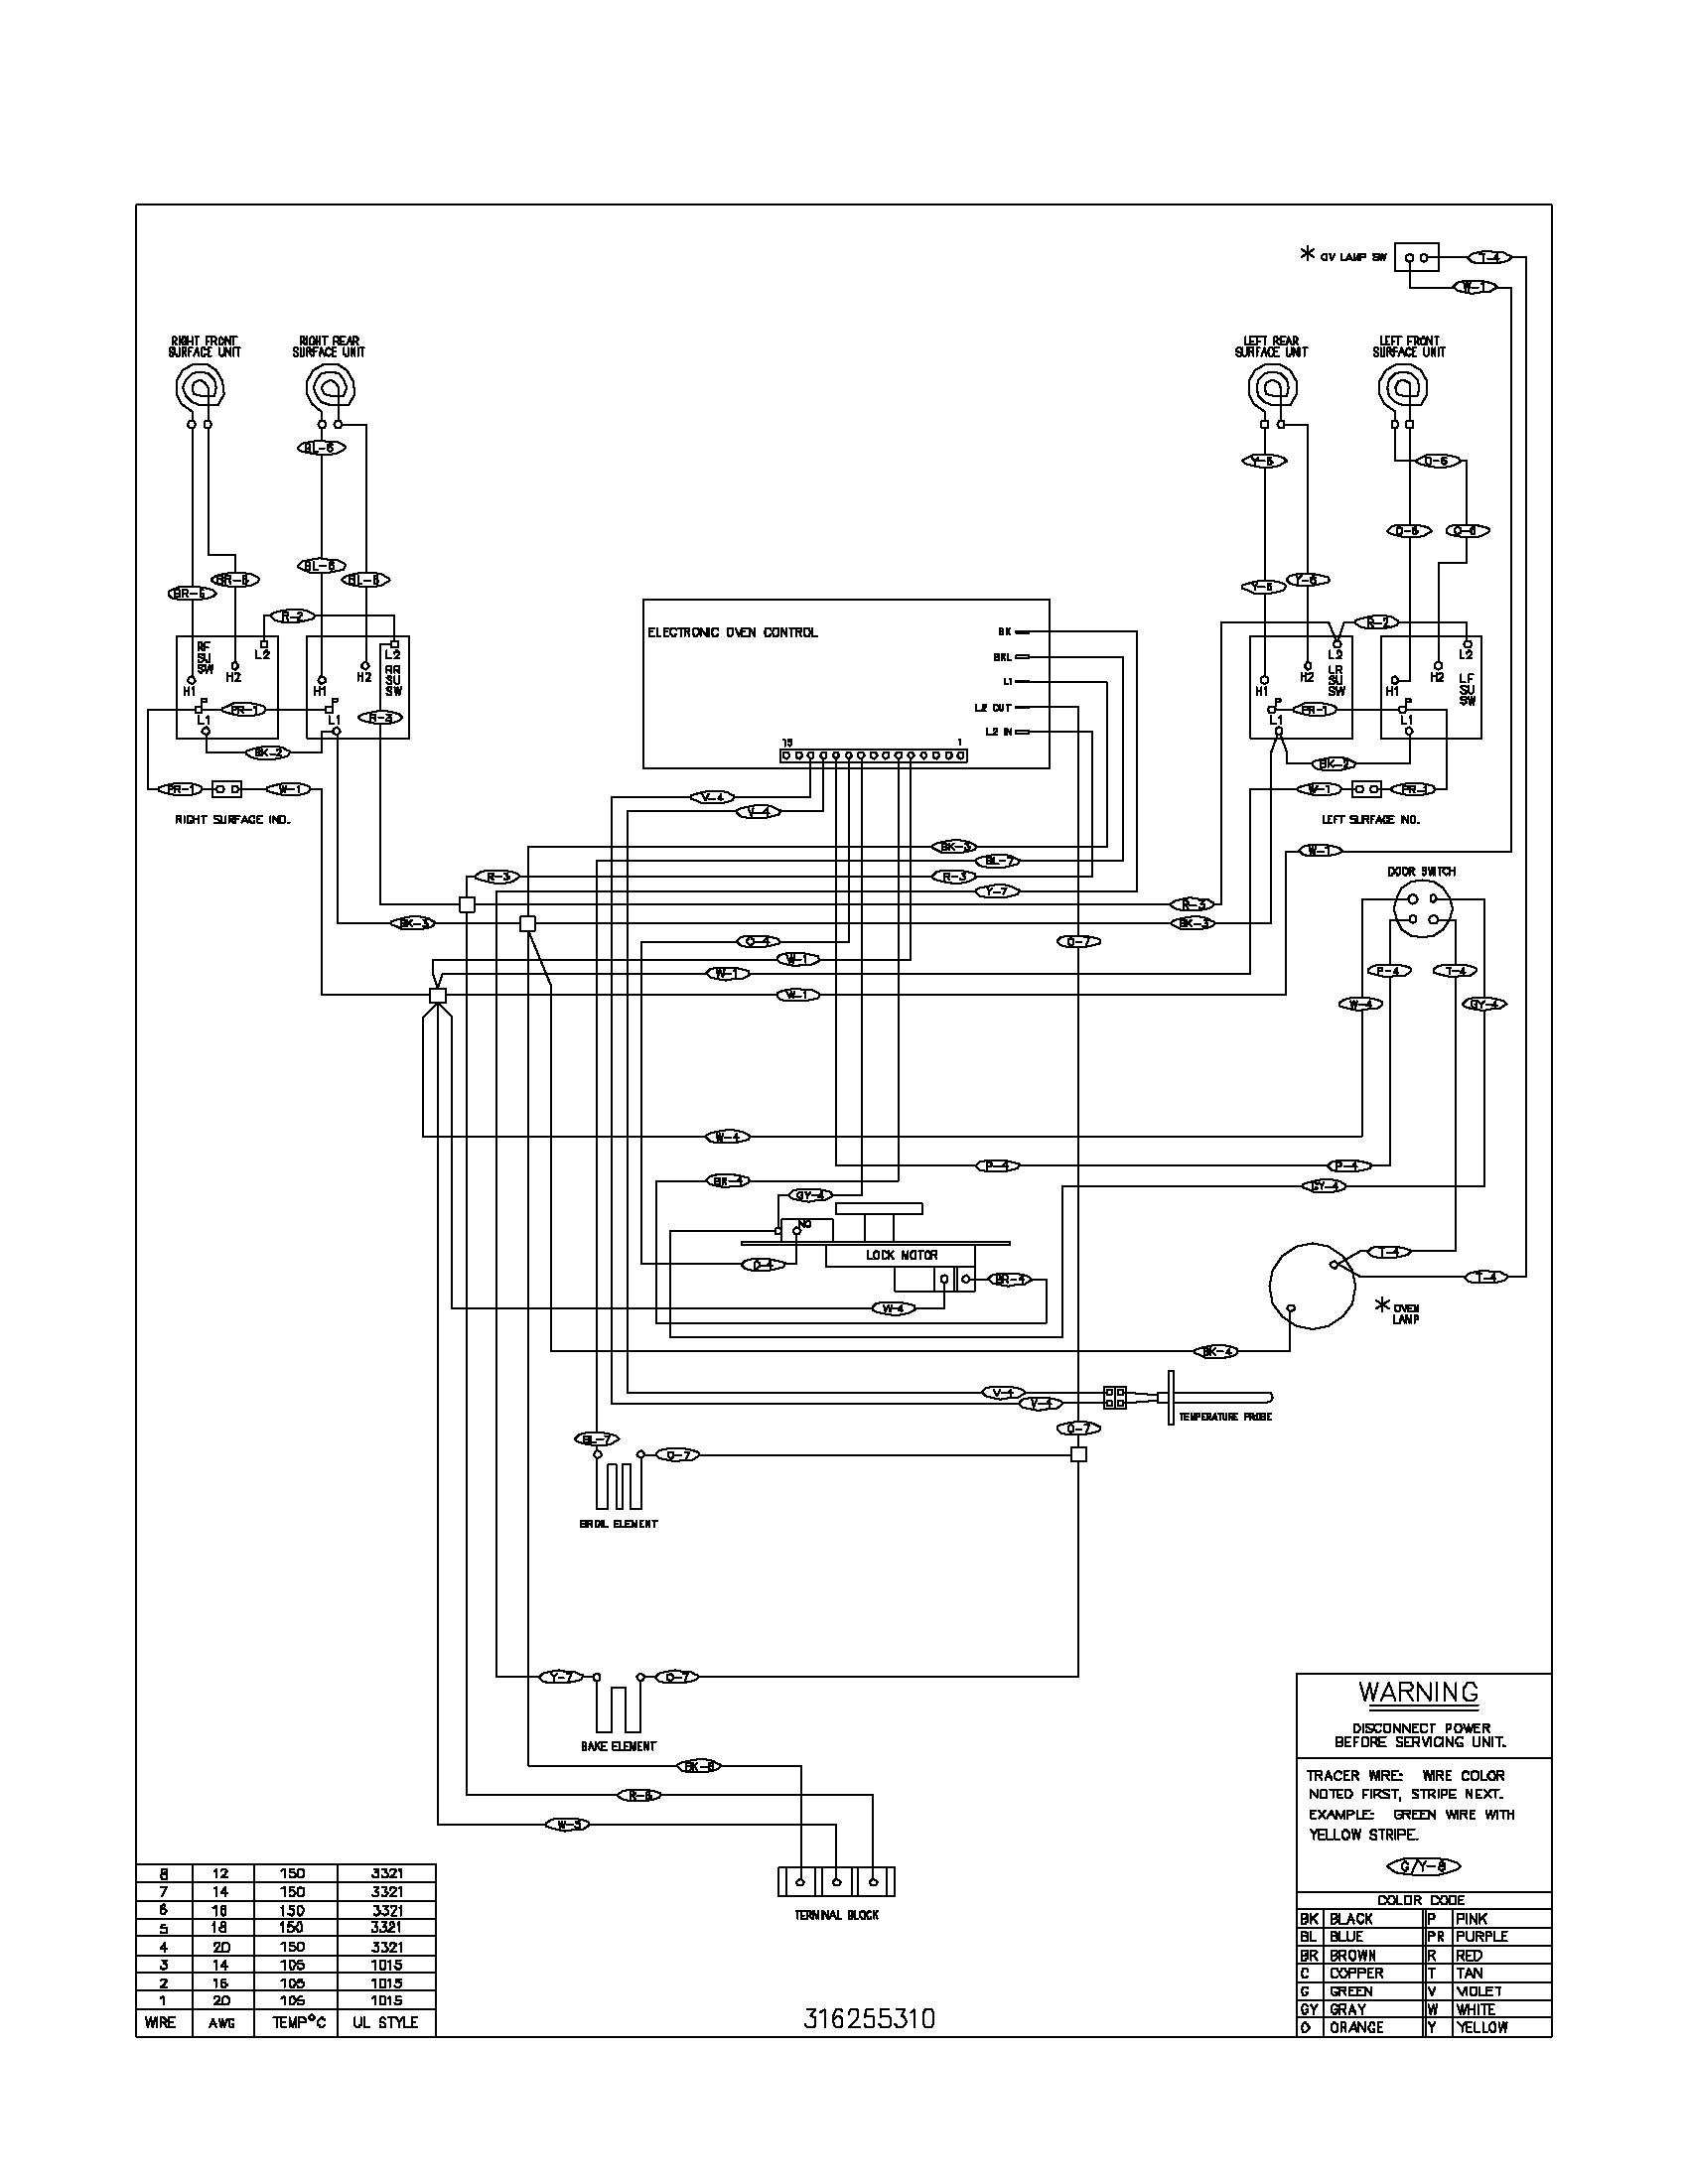 Ge Profile Cooktop Wiring Diagram Excellent Electrical Oven Jkp13gop2bp Library Rh 56 Evitta De 240v